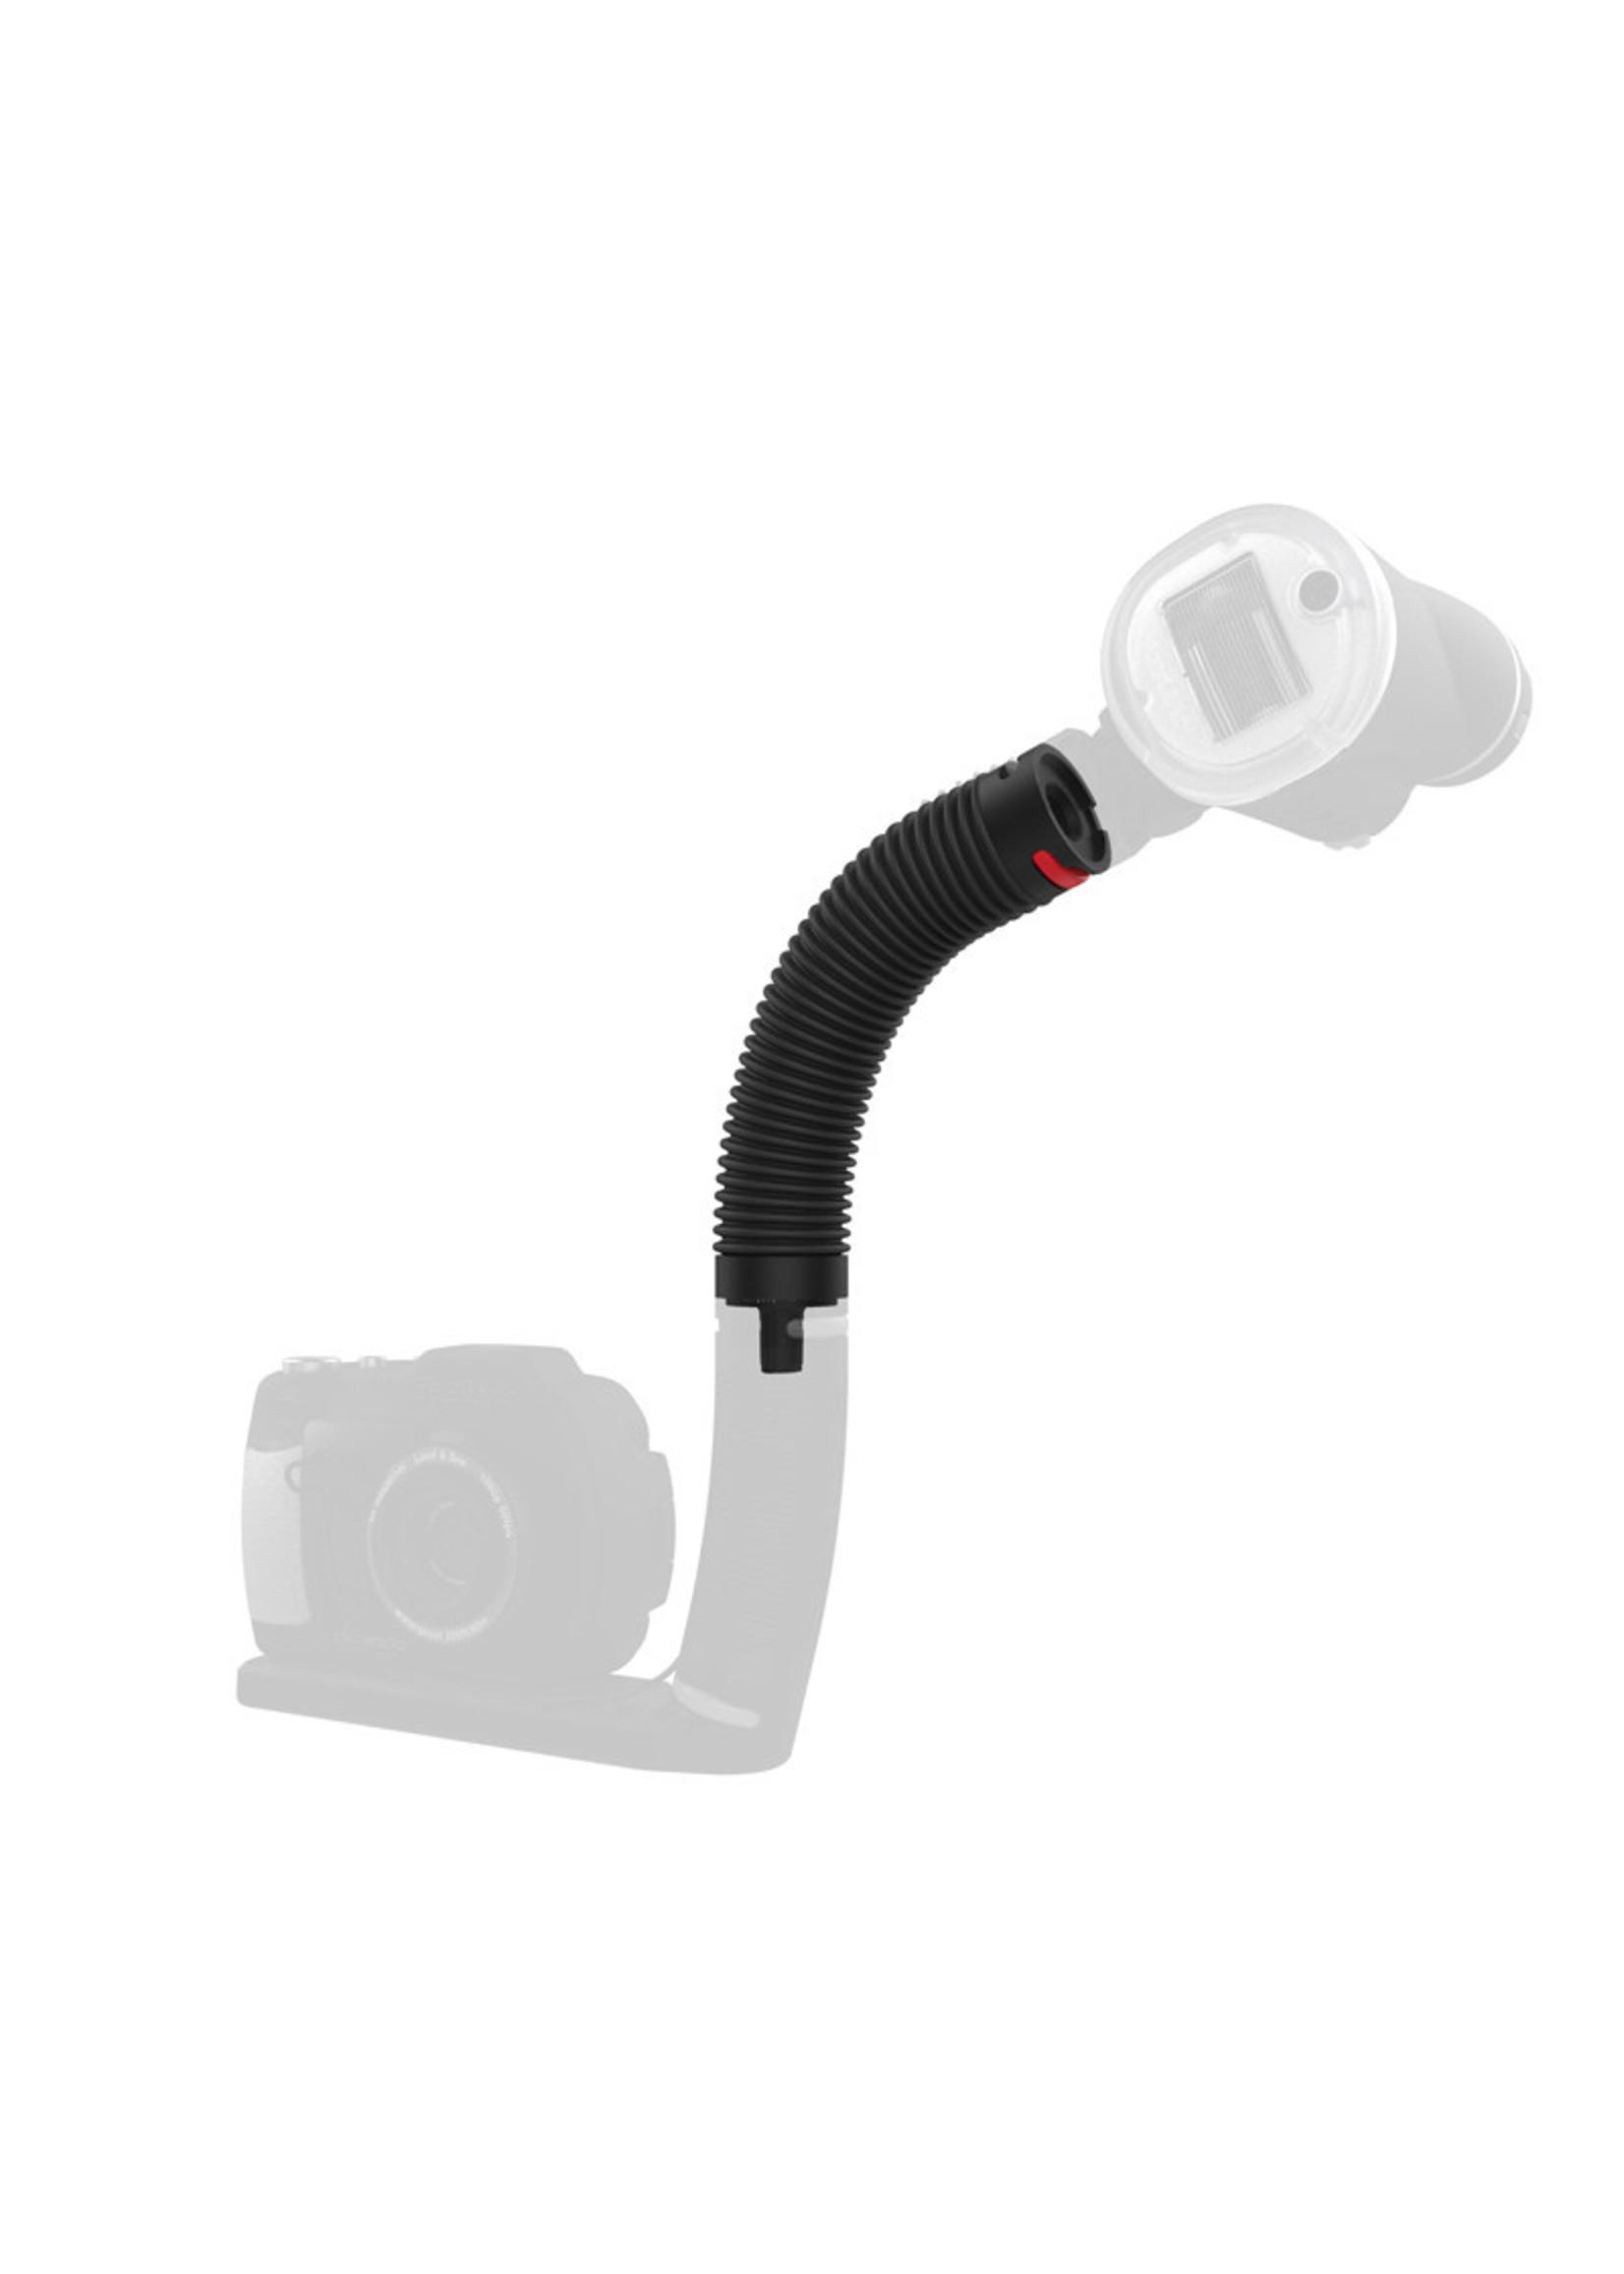 Sealife Flex-Connect Arm